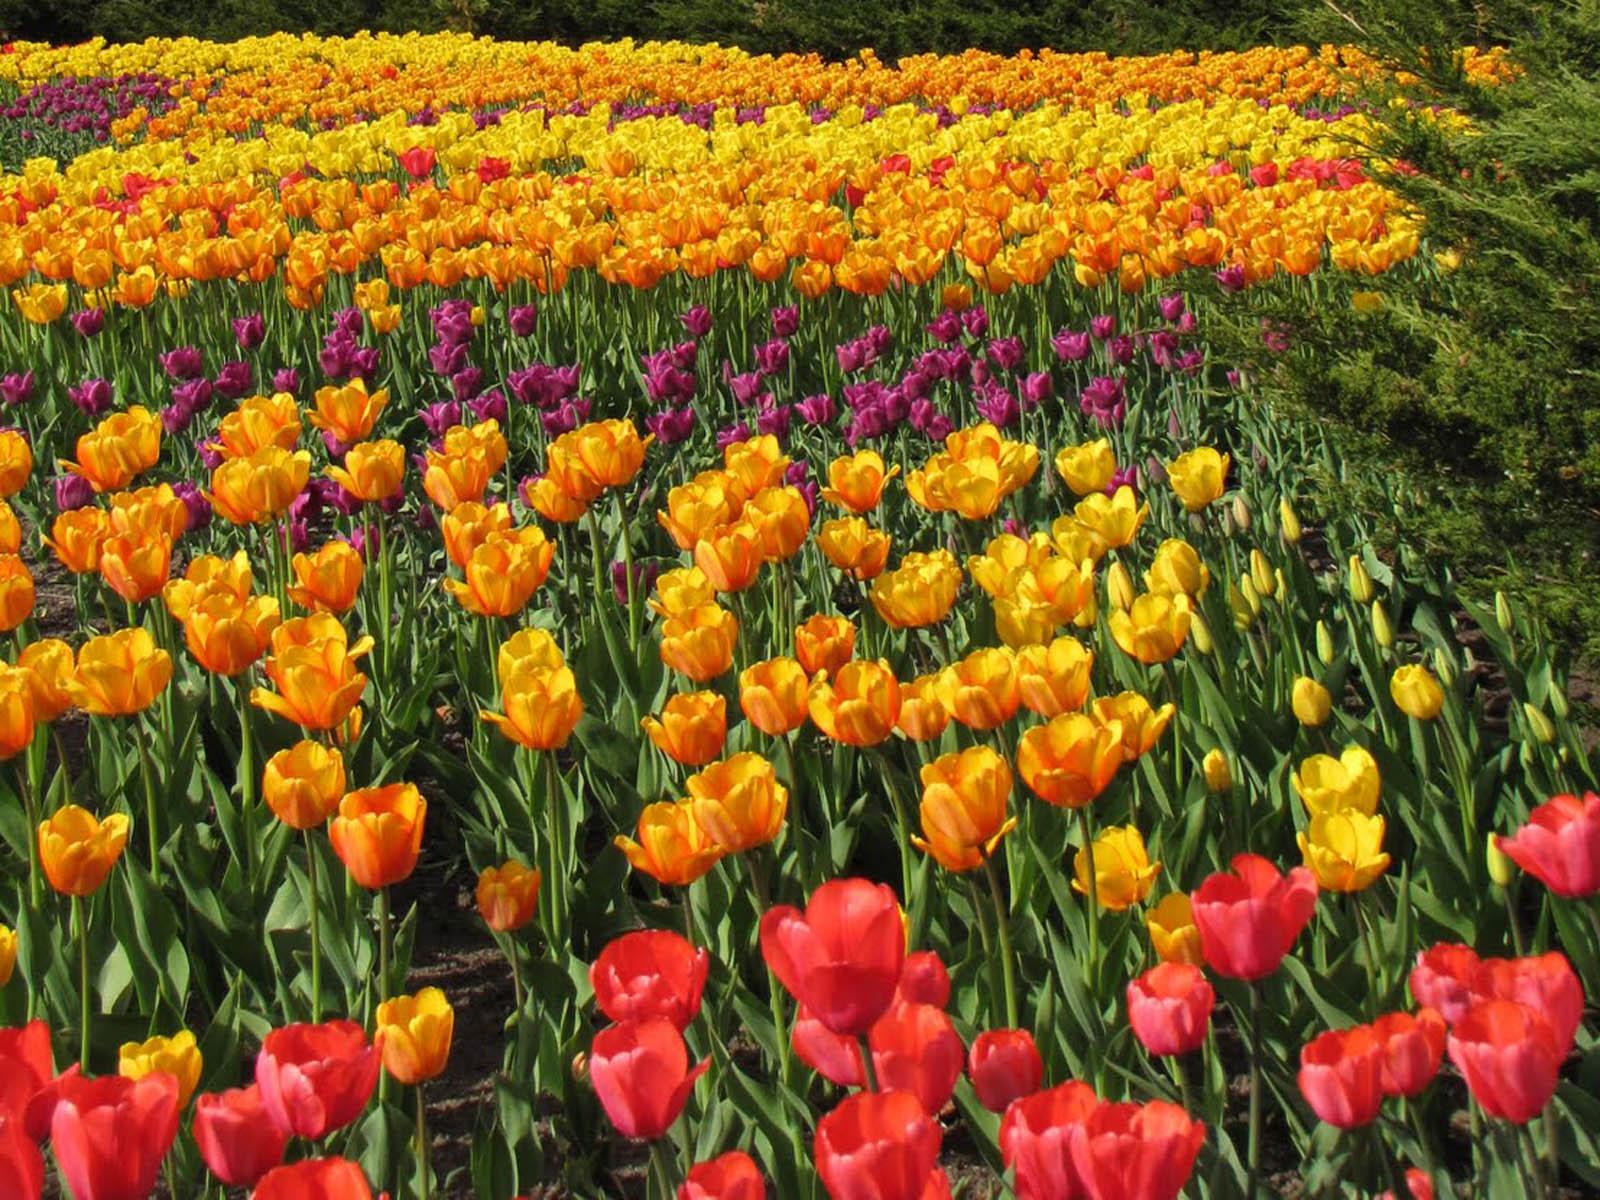 Wallpapers: Ottawa Tulips